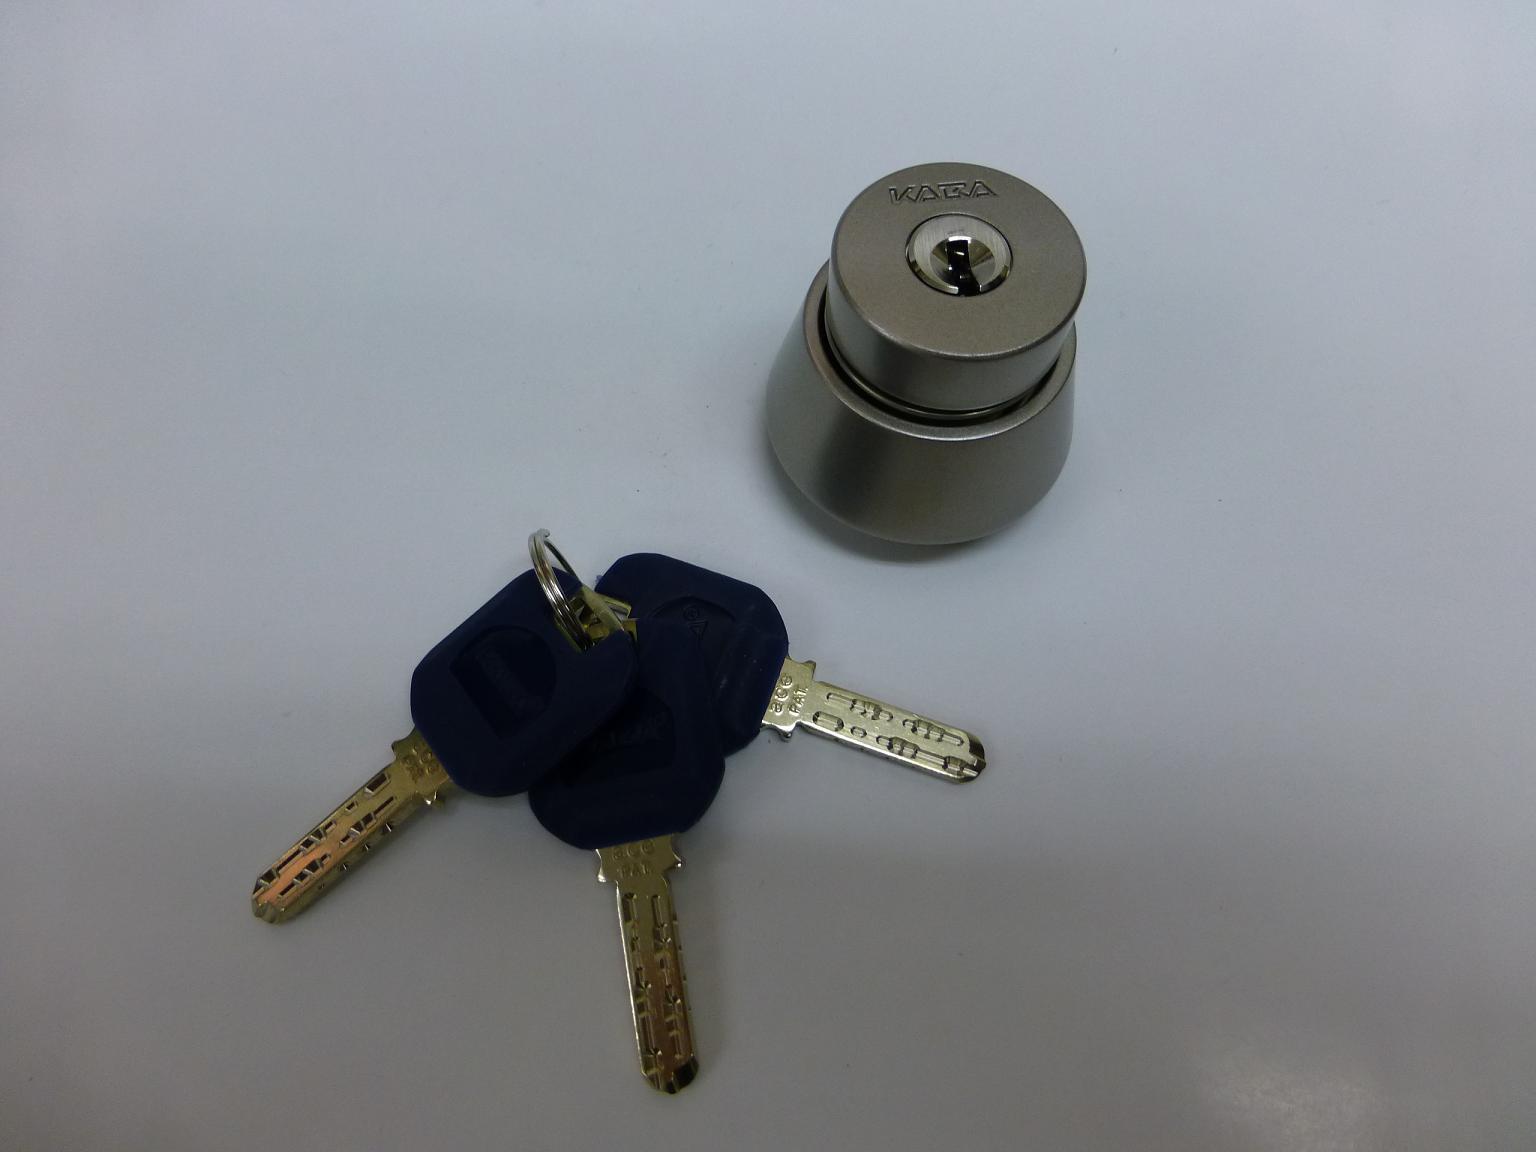 KABA メーカー公式 正規品 交換シリンダーカバエースMIWA対応LA SV 3237